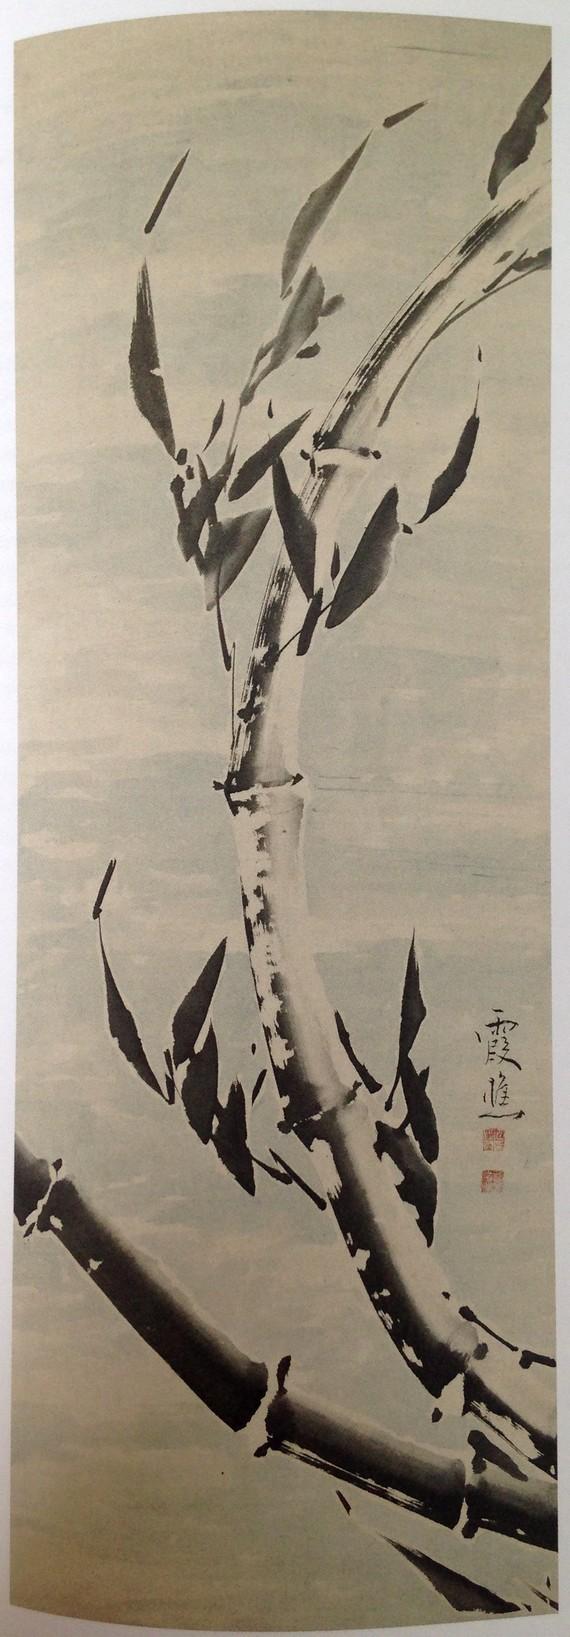 Bambous-dans-la-tourmente-de-Ike-no -aoga